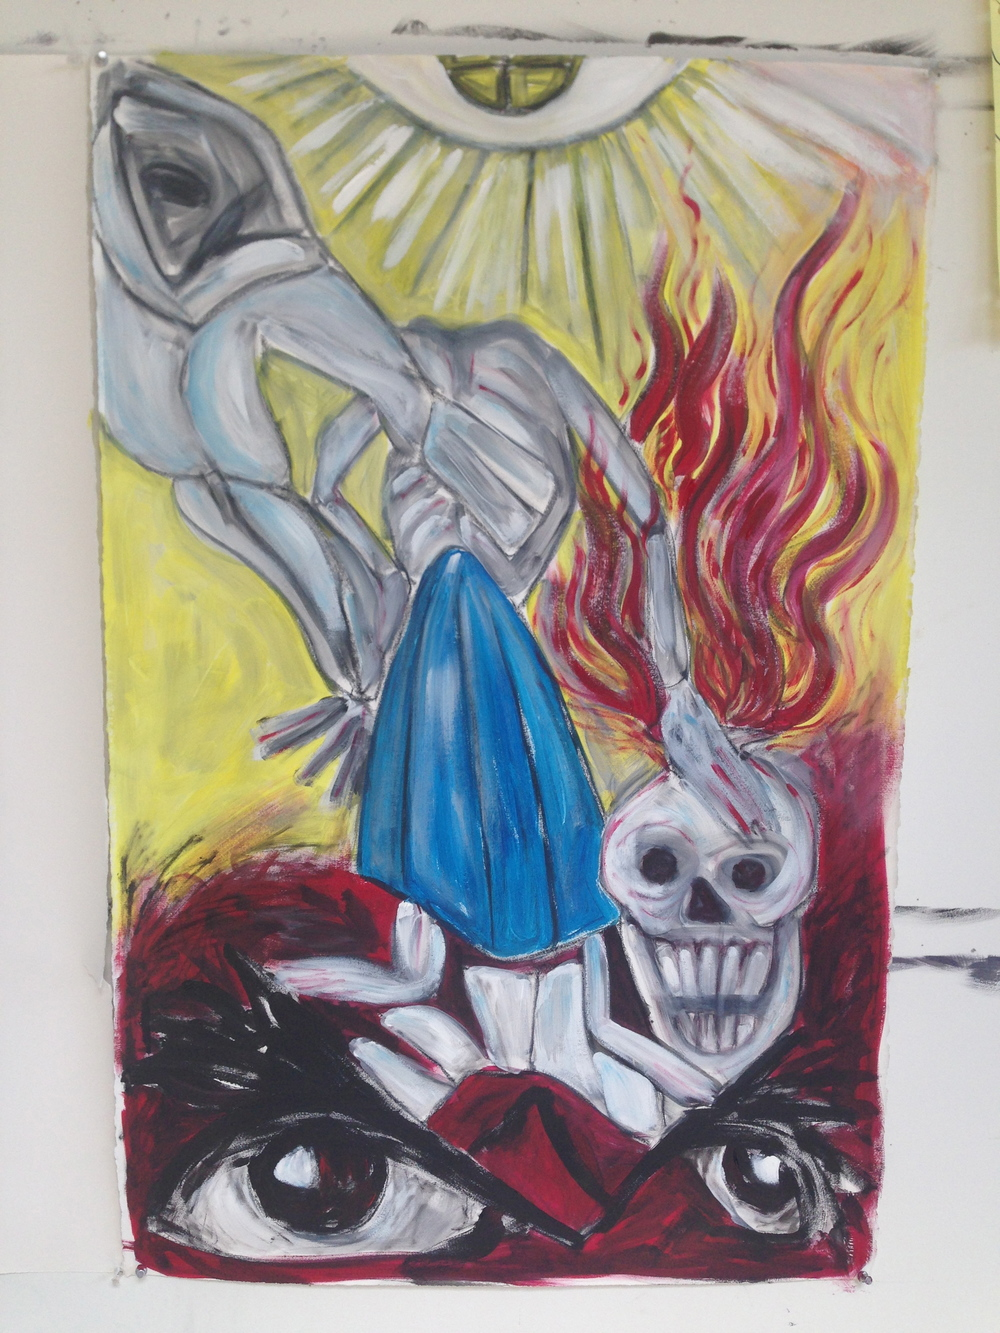 """Skull, Figure, Horse""  26"" x 40""  Oil on canvas"